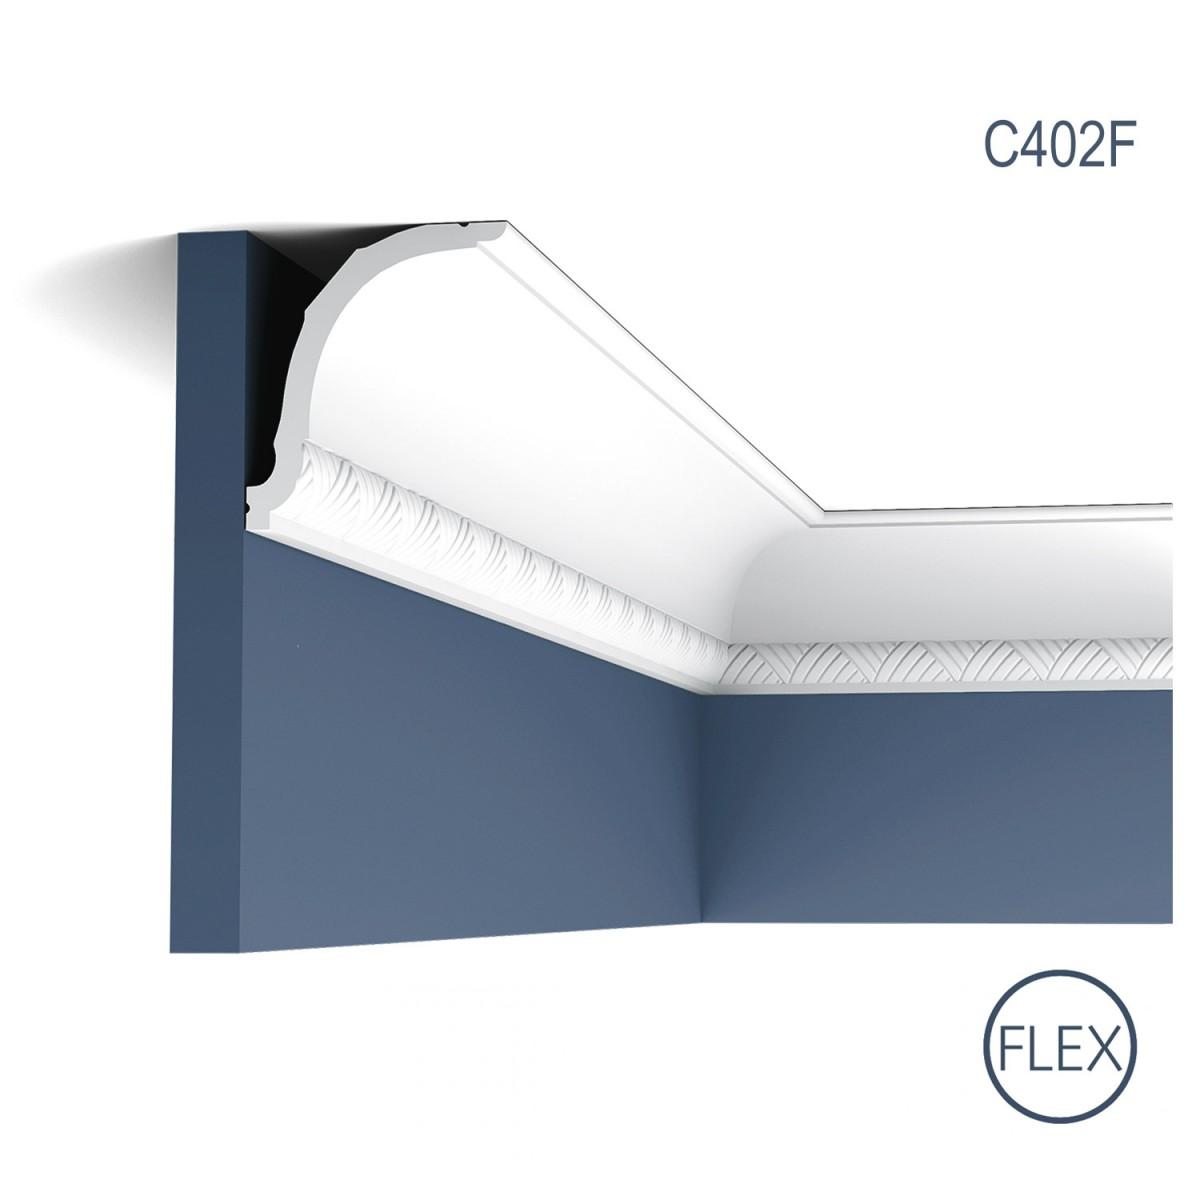 Cornisa Luxxus C402F, Dimensiuni: 200 X 10.7 X 9.4 cm, Orac Decor